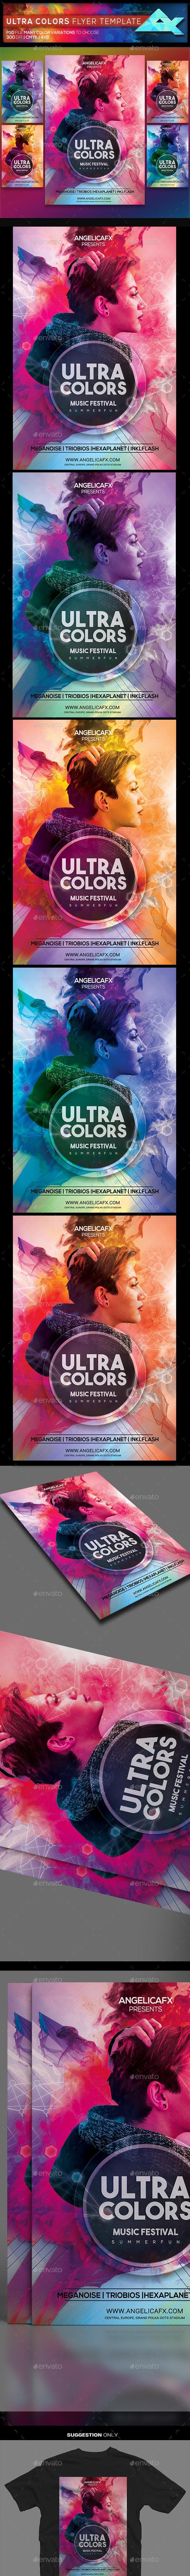 Ultra Colors Photoshop Flyer Template - Flyers Print Templates